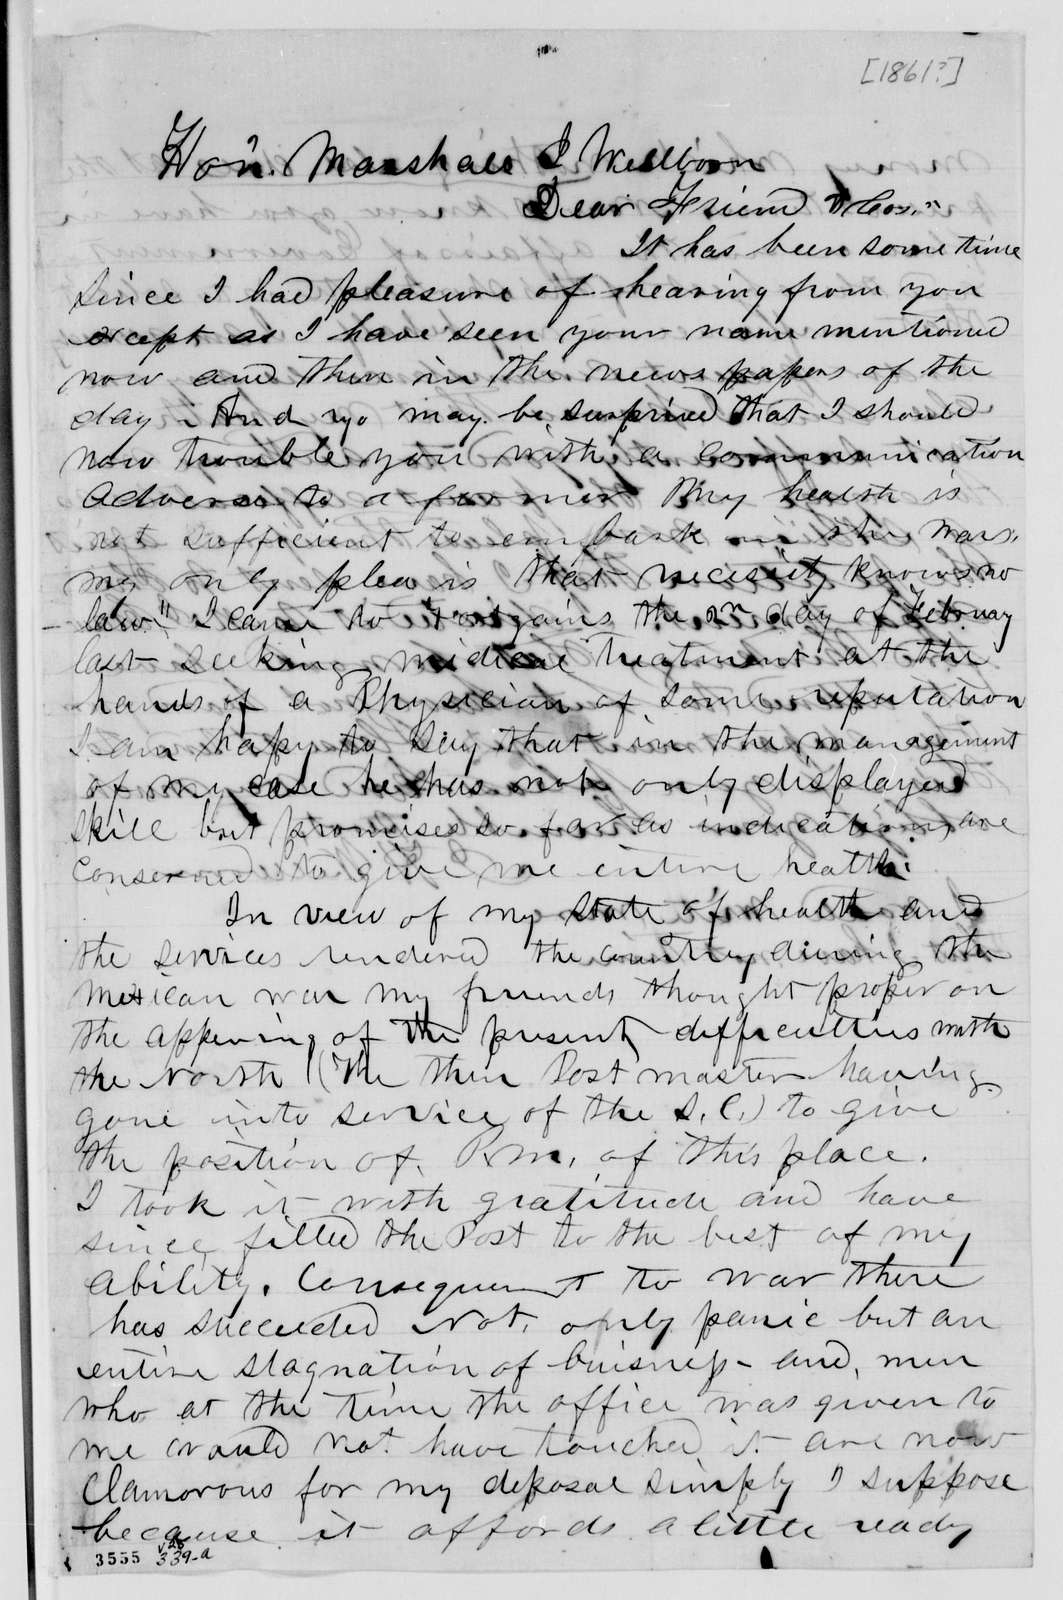 Alexander Hamilton Stephens Papers: General Correspondence, 1784-1886; 1861, Dec. 28-1862, Feb. 1